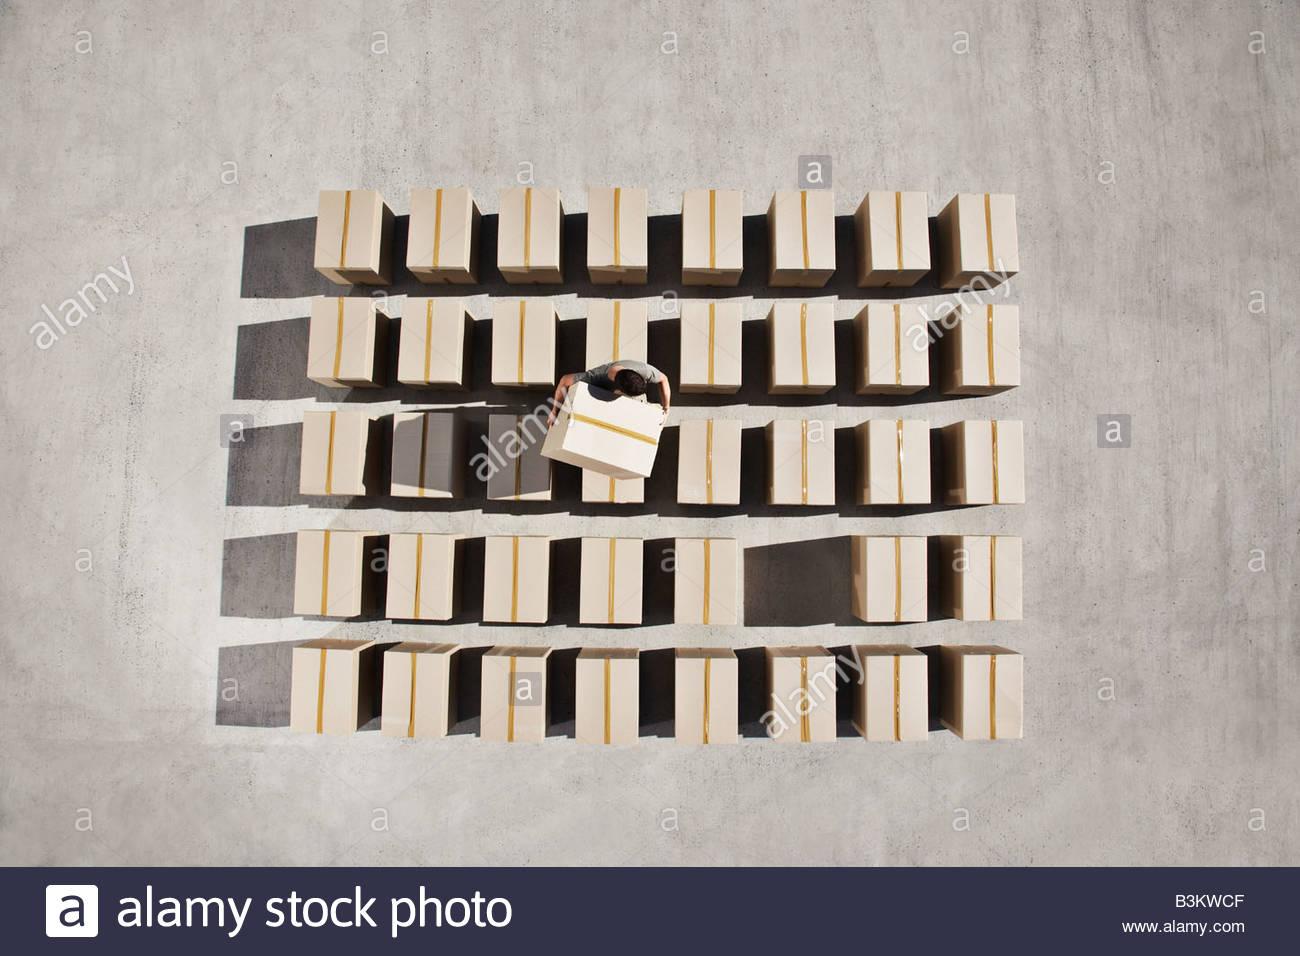 Man organizing boxes outdoors - Stock Image